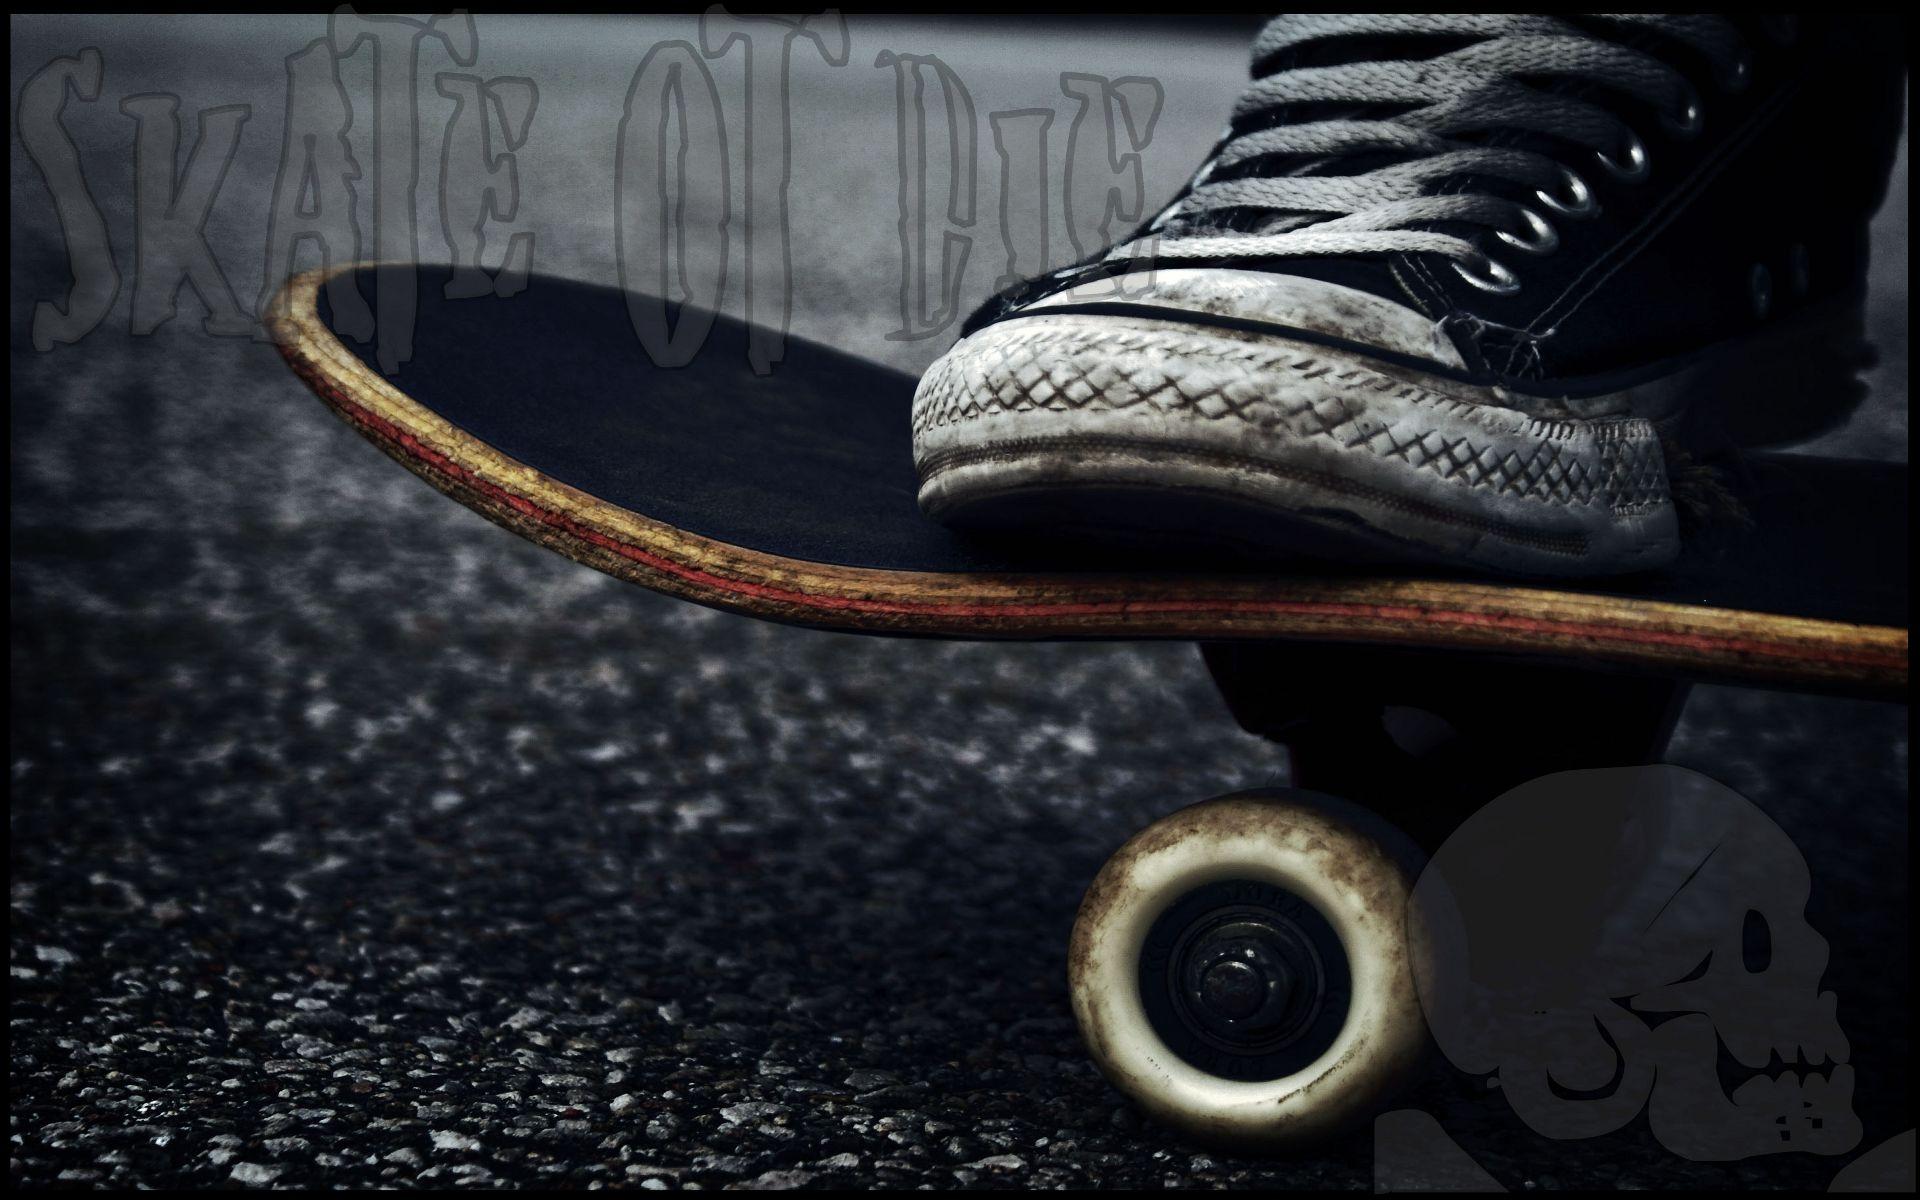 Skateboard : se déplacer autrement